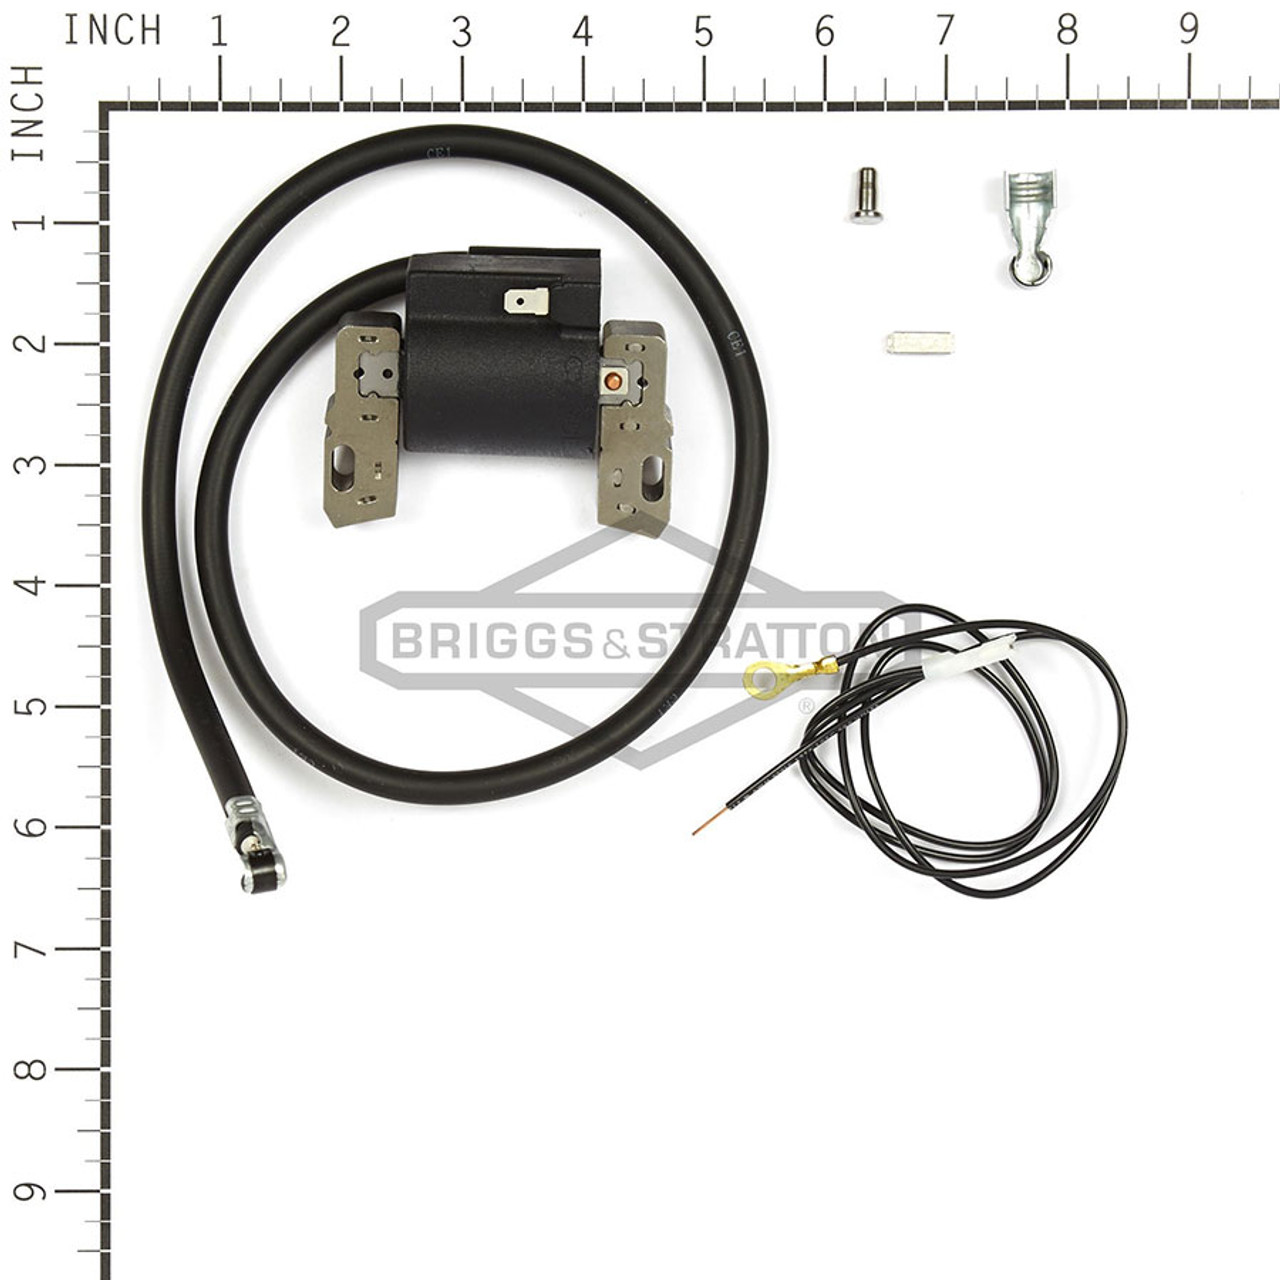 medium resolution of 397358 brigg wiring diagram